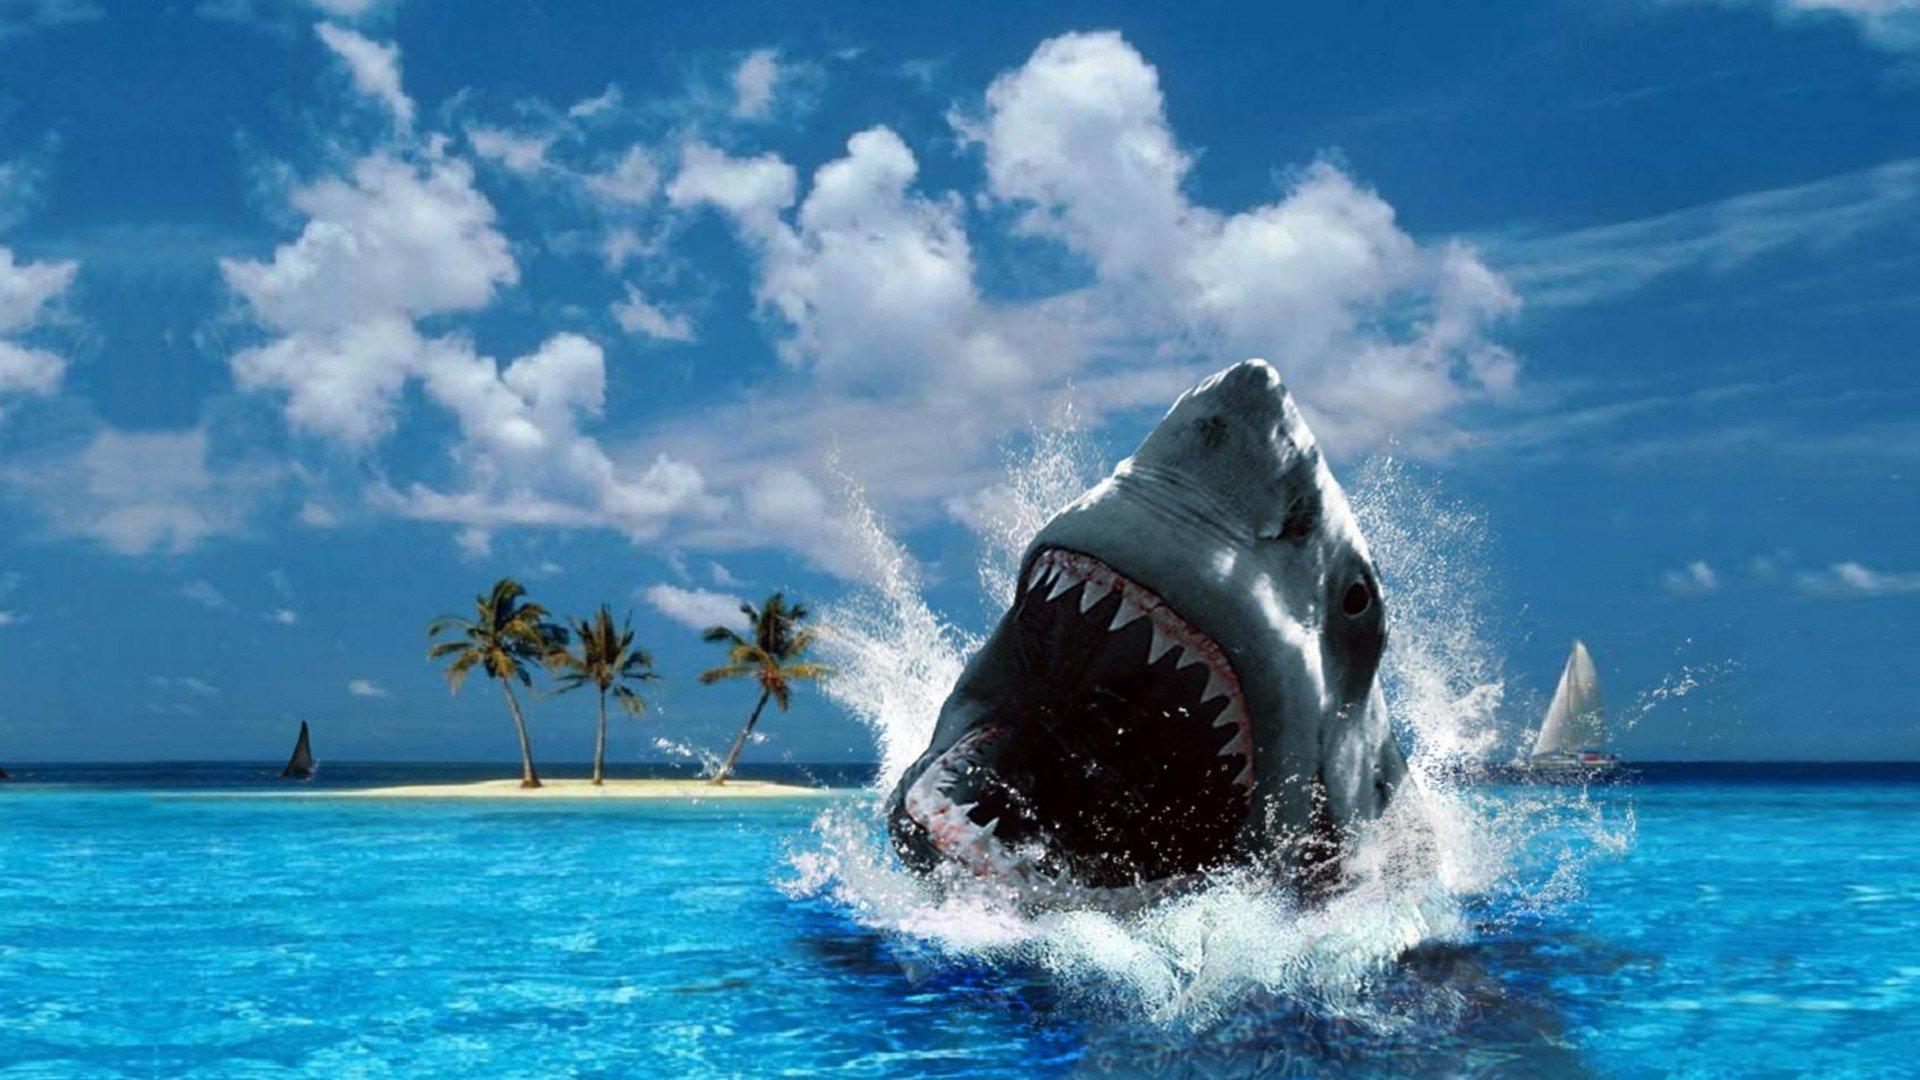 Clearest Water In The World Shark Week Wallpaper Wallpapersafari